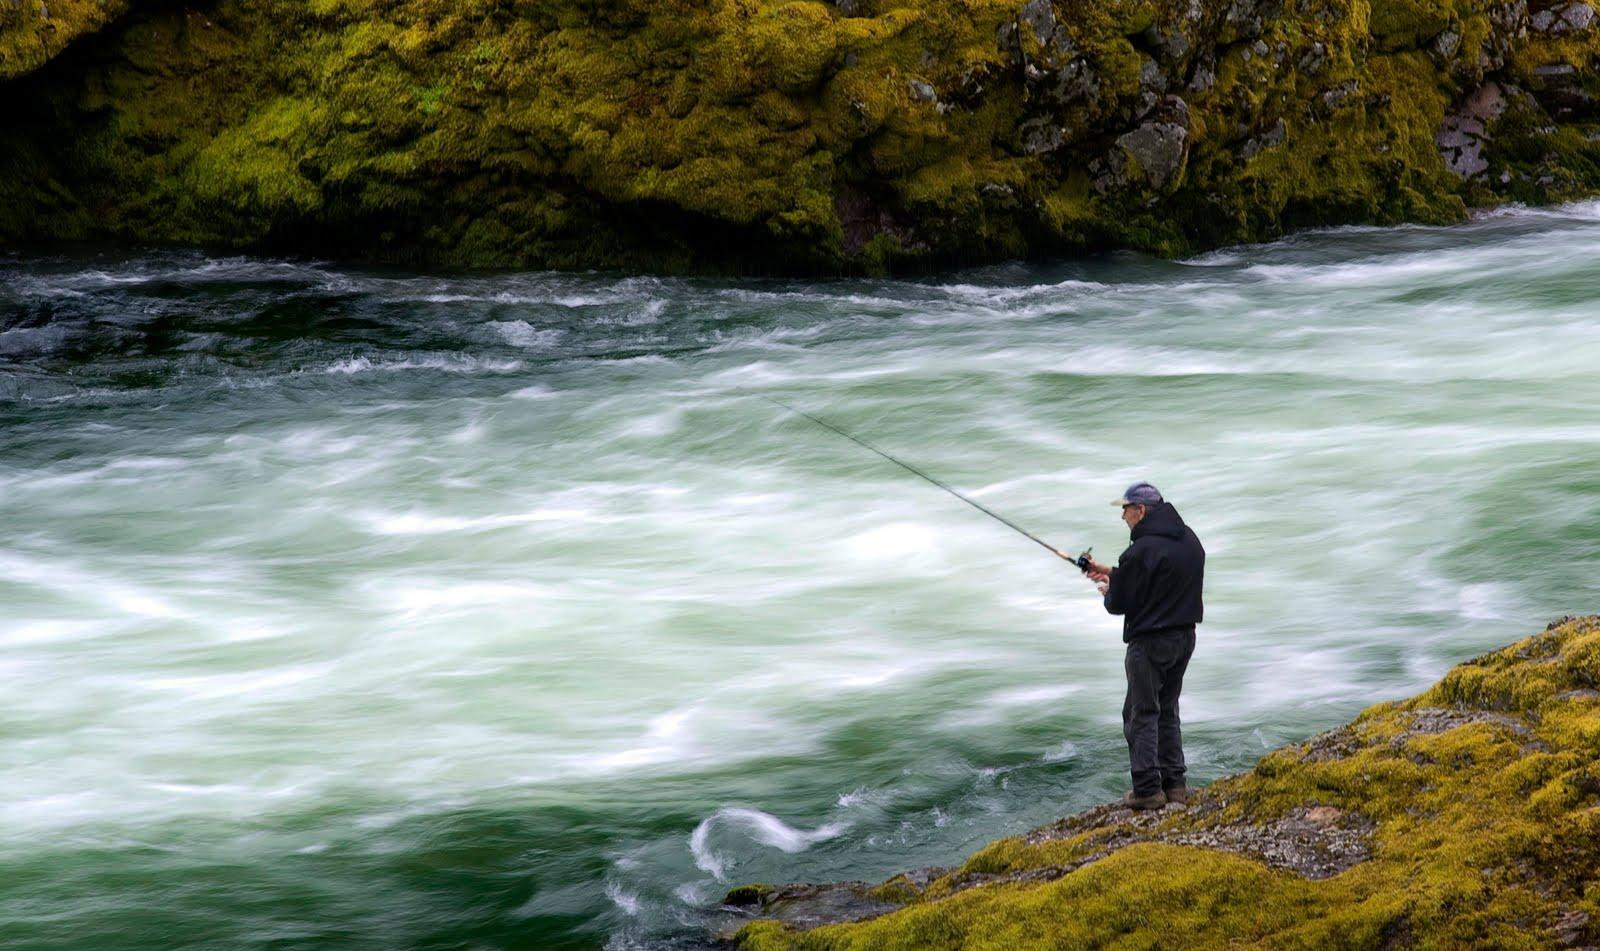 Robin loznak photography north umpqua chinook fishing for Oregon salmon fishing